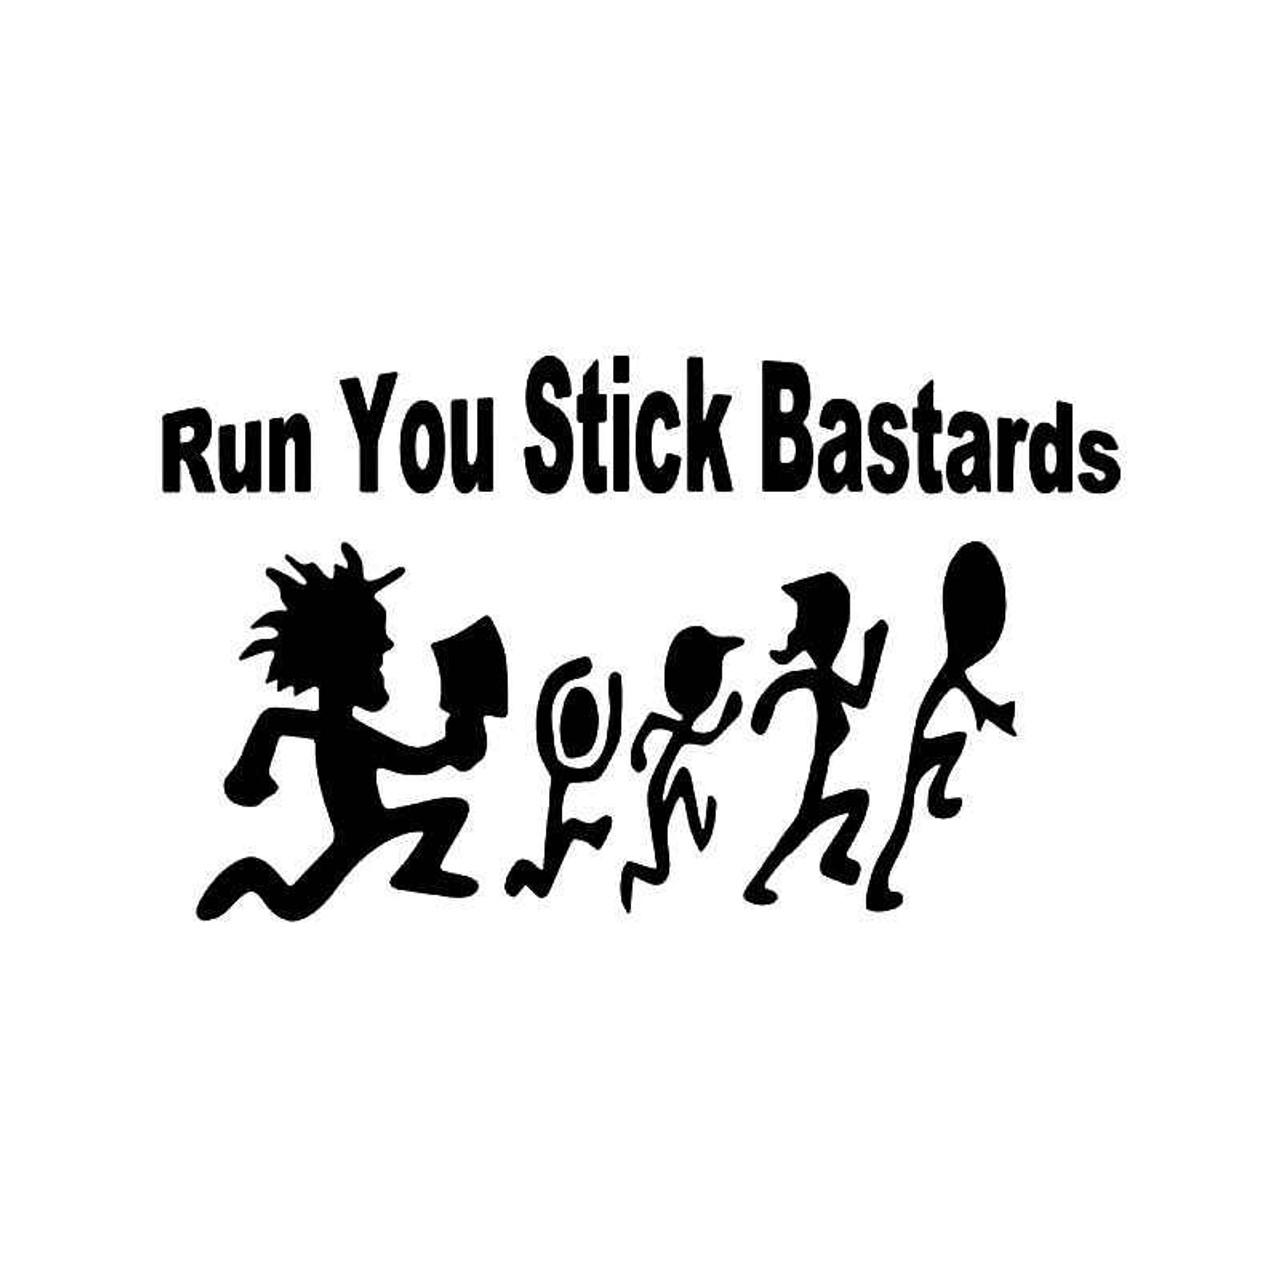 run you stick bastards hatchet man vinyl sticker